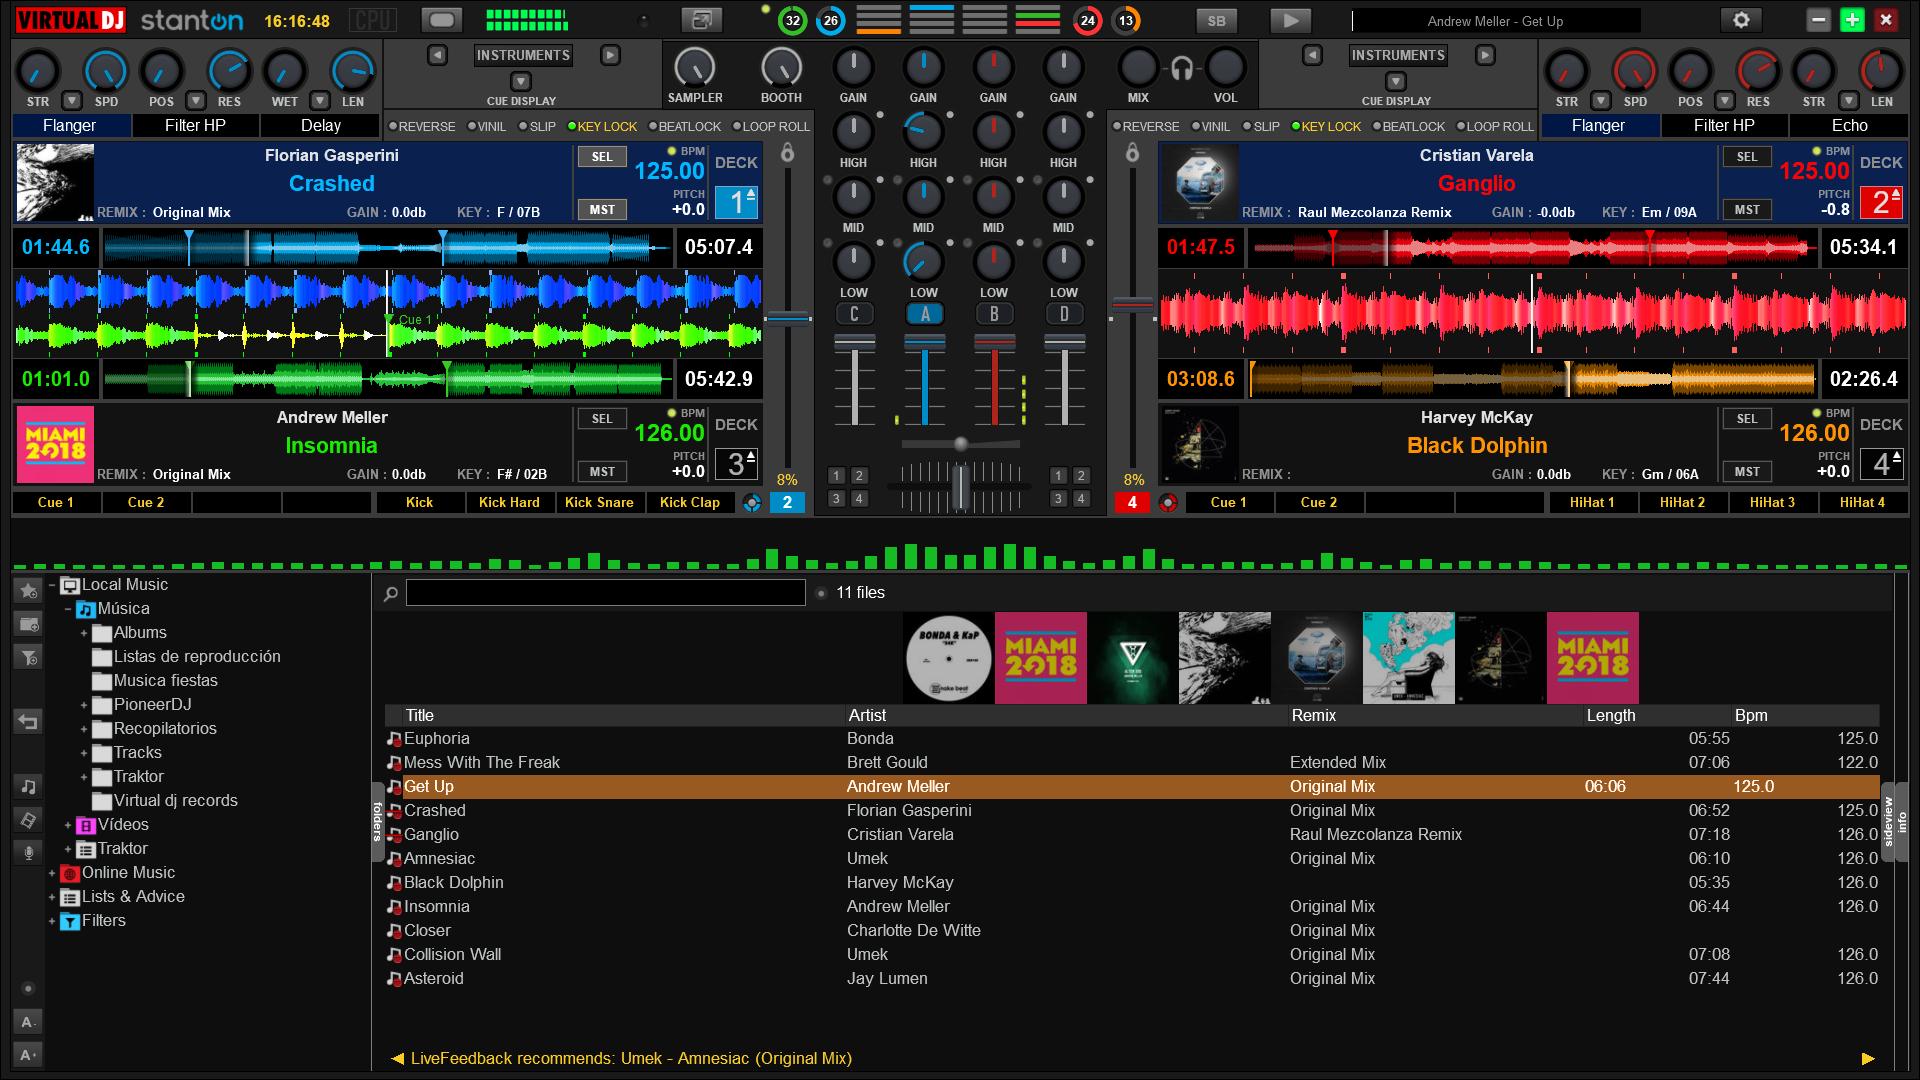 VIRTUAL DJ 3 DJC TÉLÉCHARGER